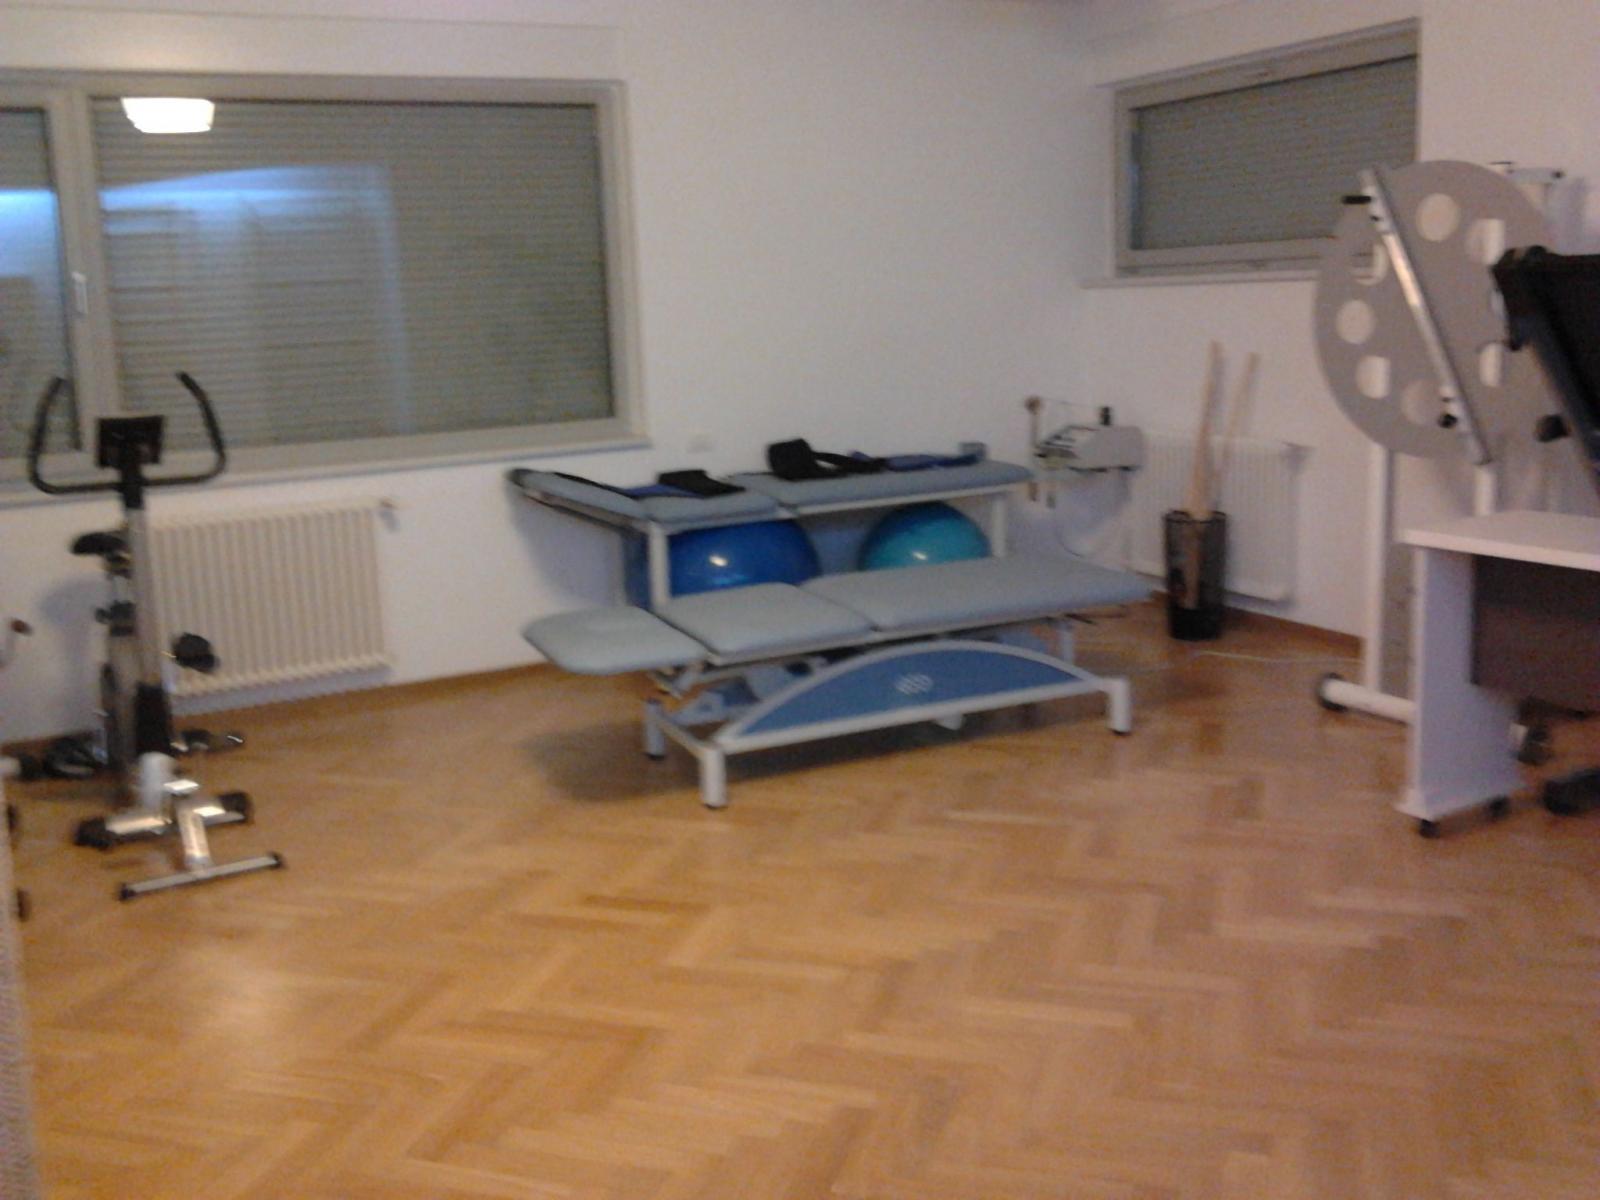 IVAKINETIC - Cabinet Recuperare Medicala - 2012-11-05_22.58.37.jpg